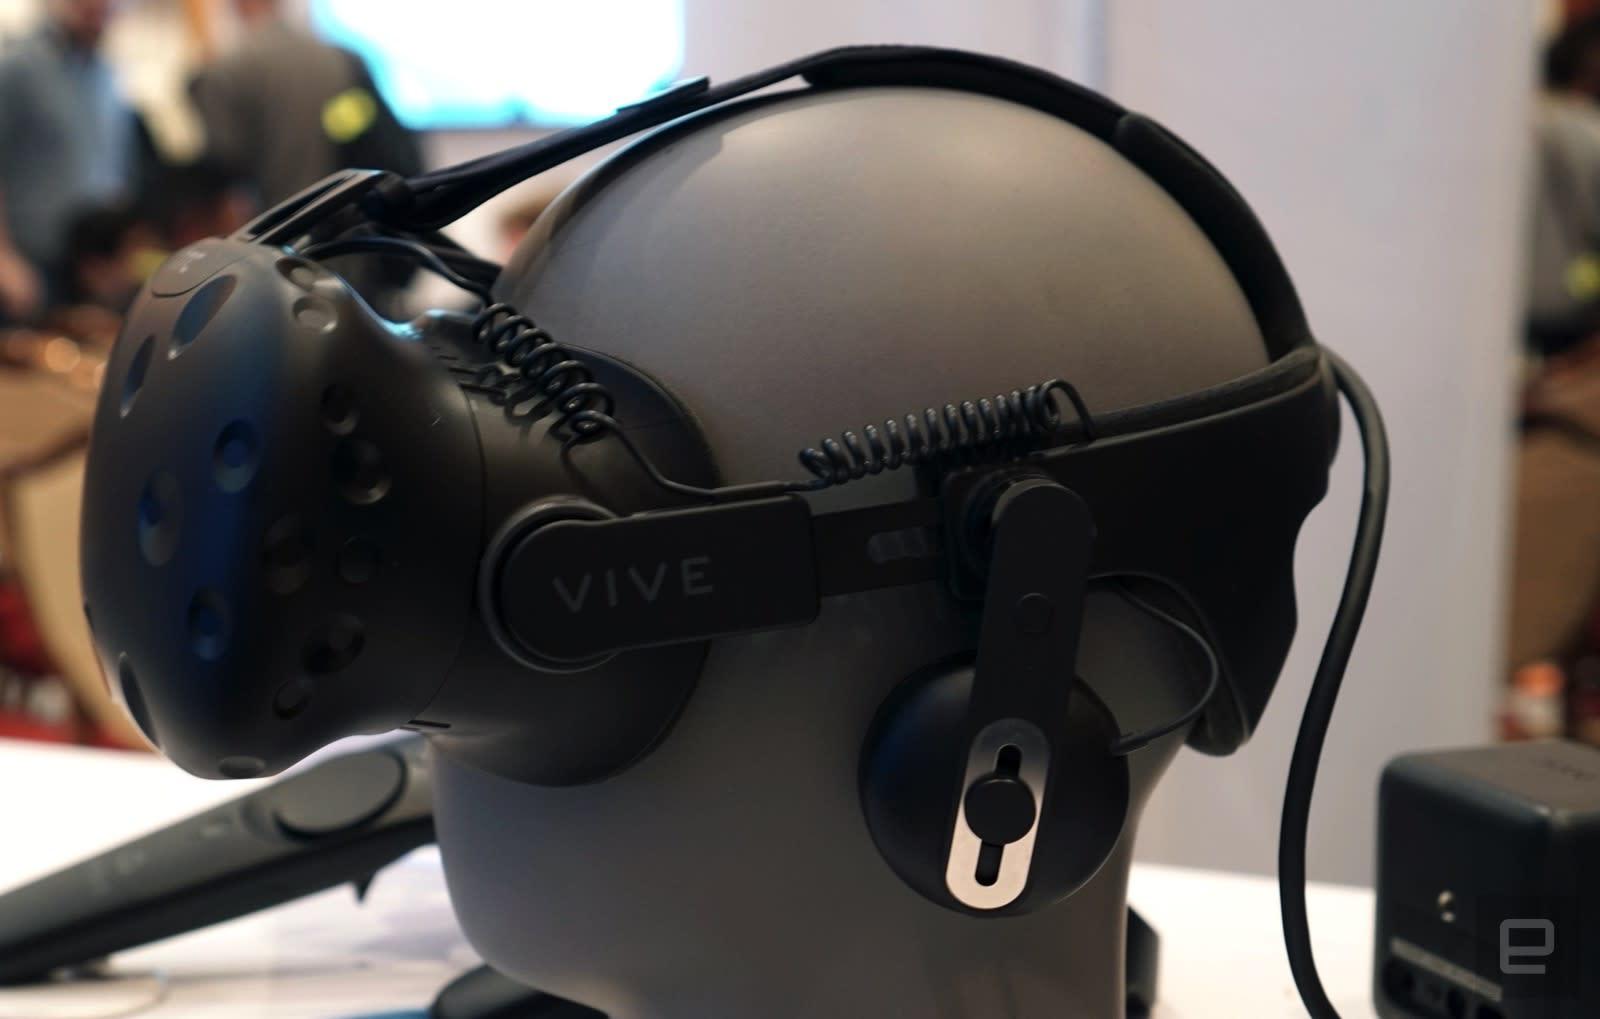 HTC+Vive+CES+2017+gallery+9.jpg